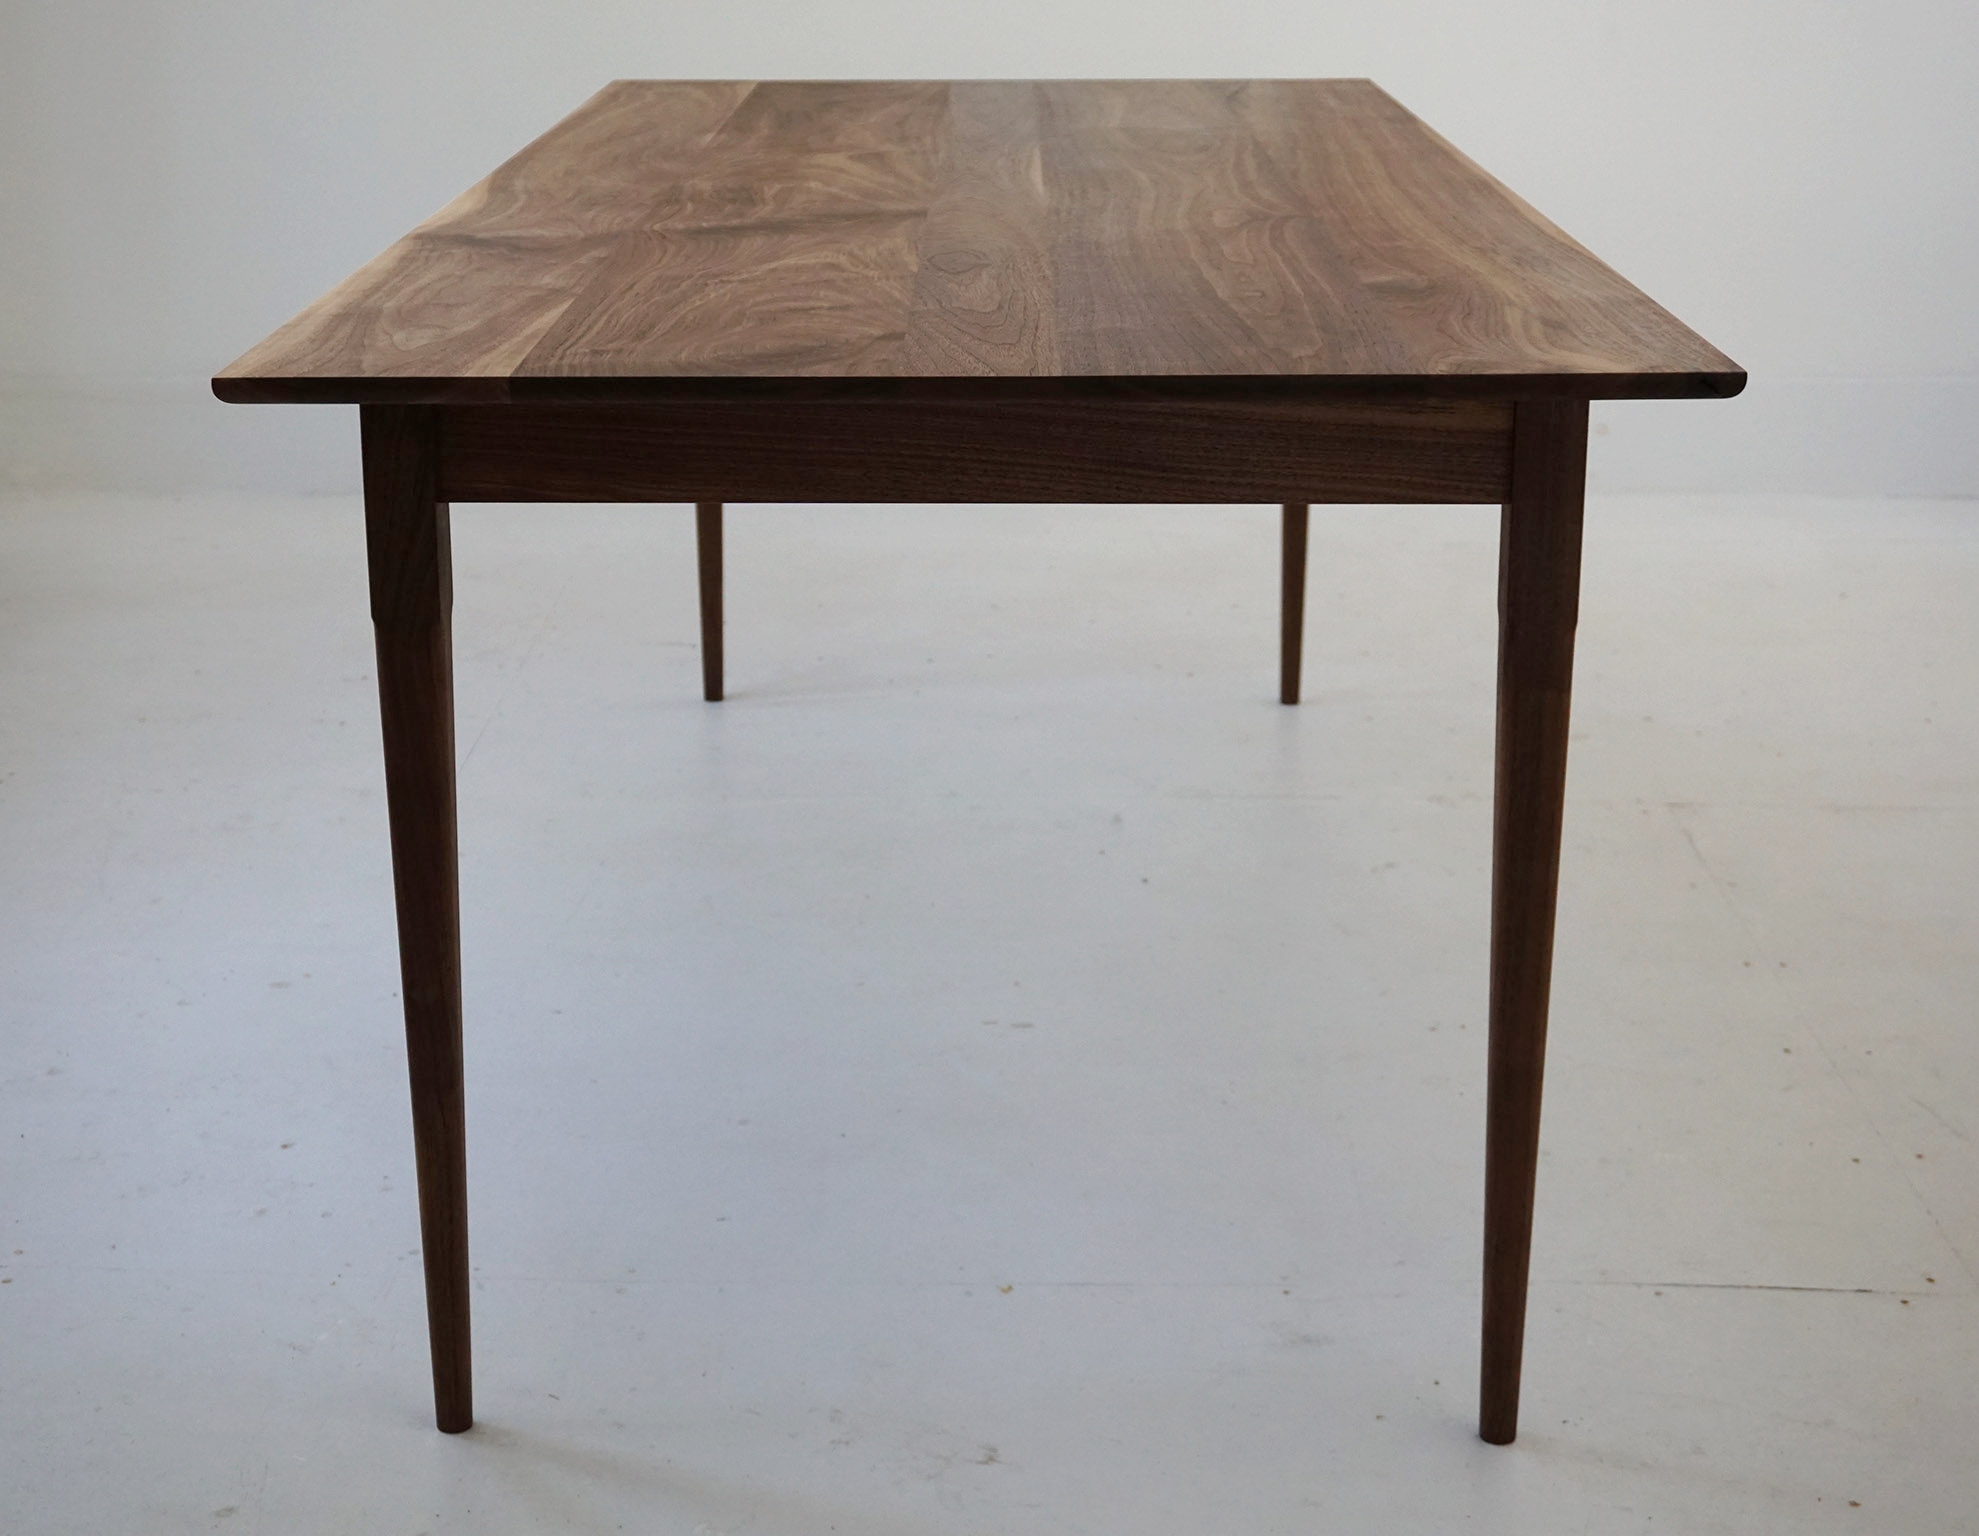 reunion.table.copy.2.web.jpg